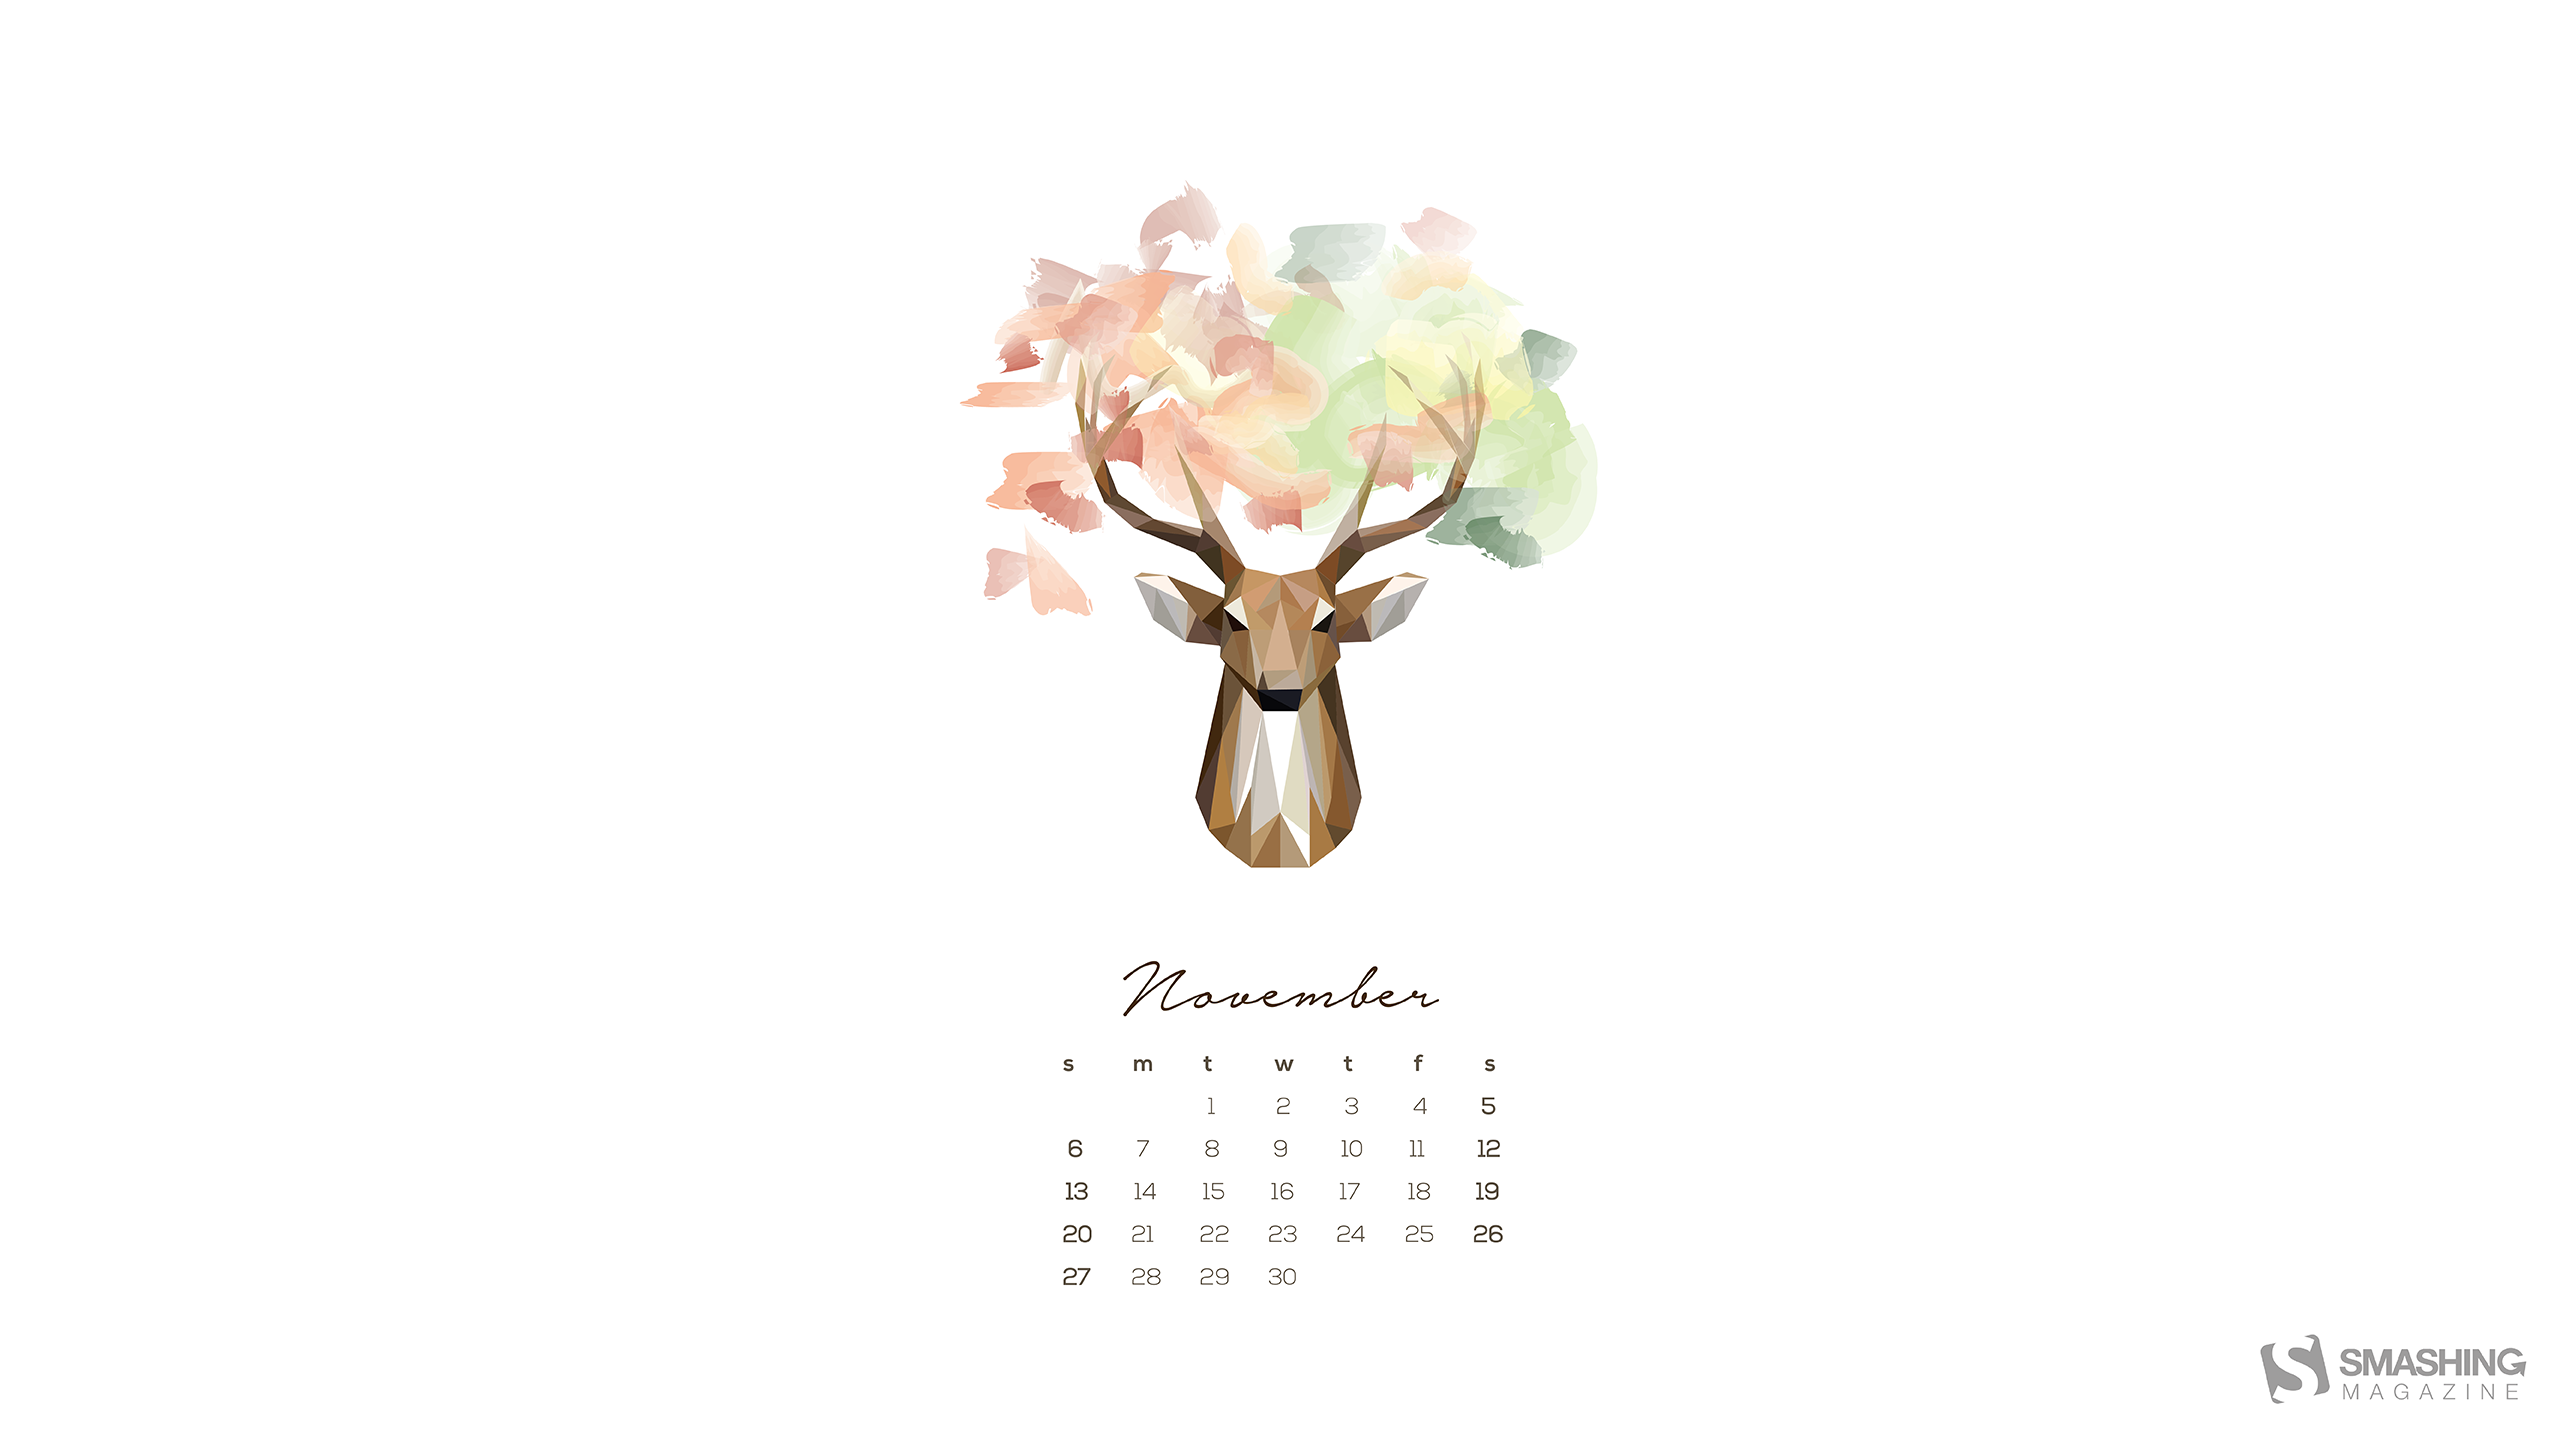 Desktop Wallpaper Calendars November 2016 Smashing Magazine